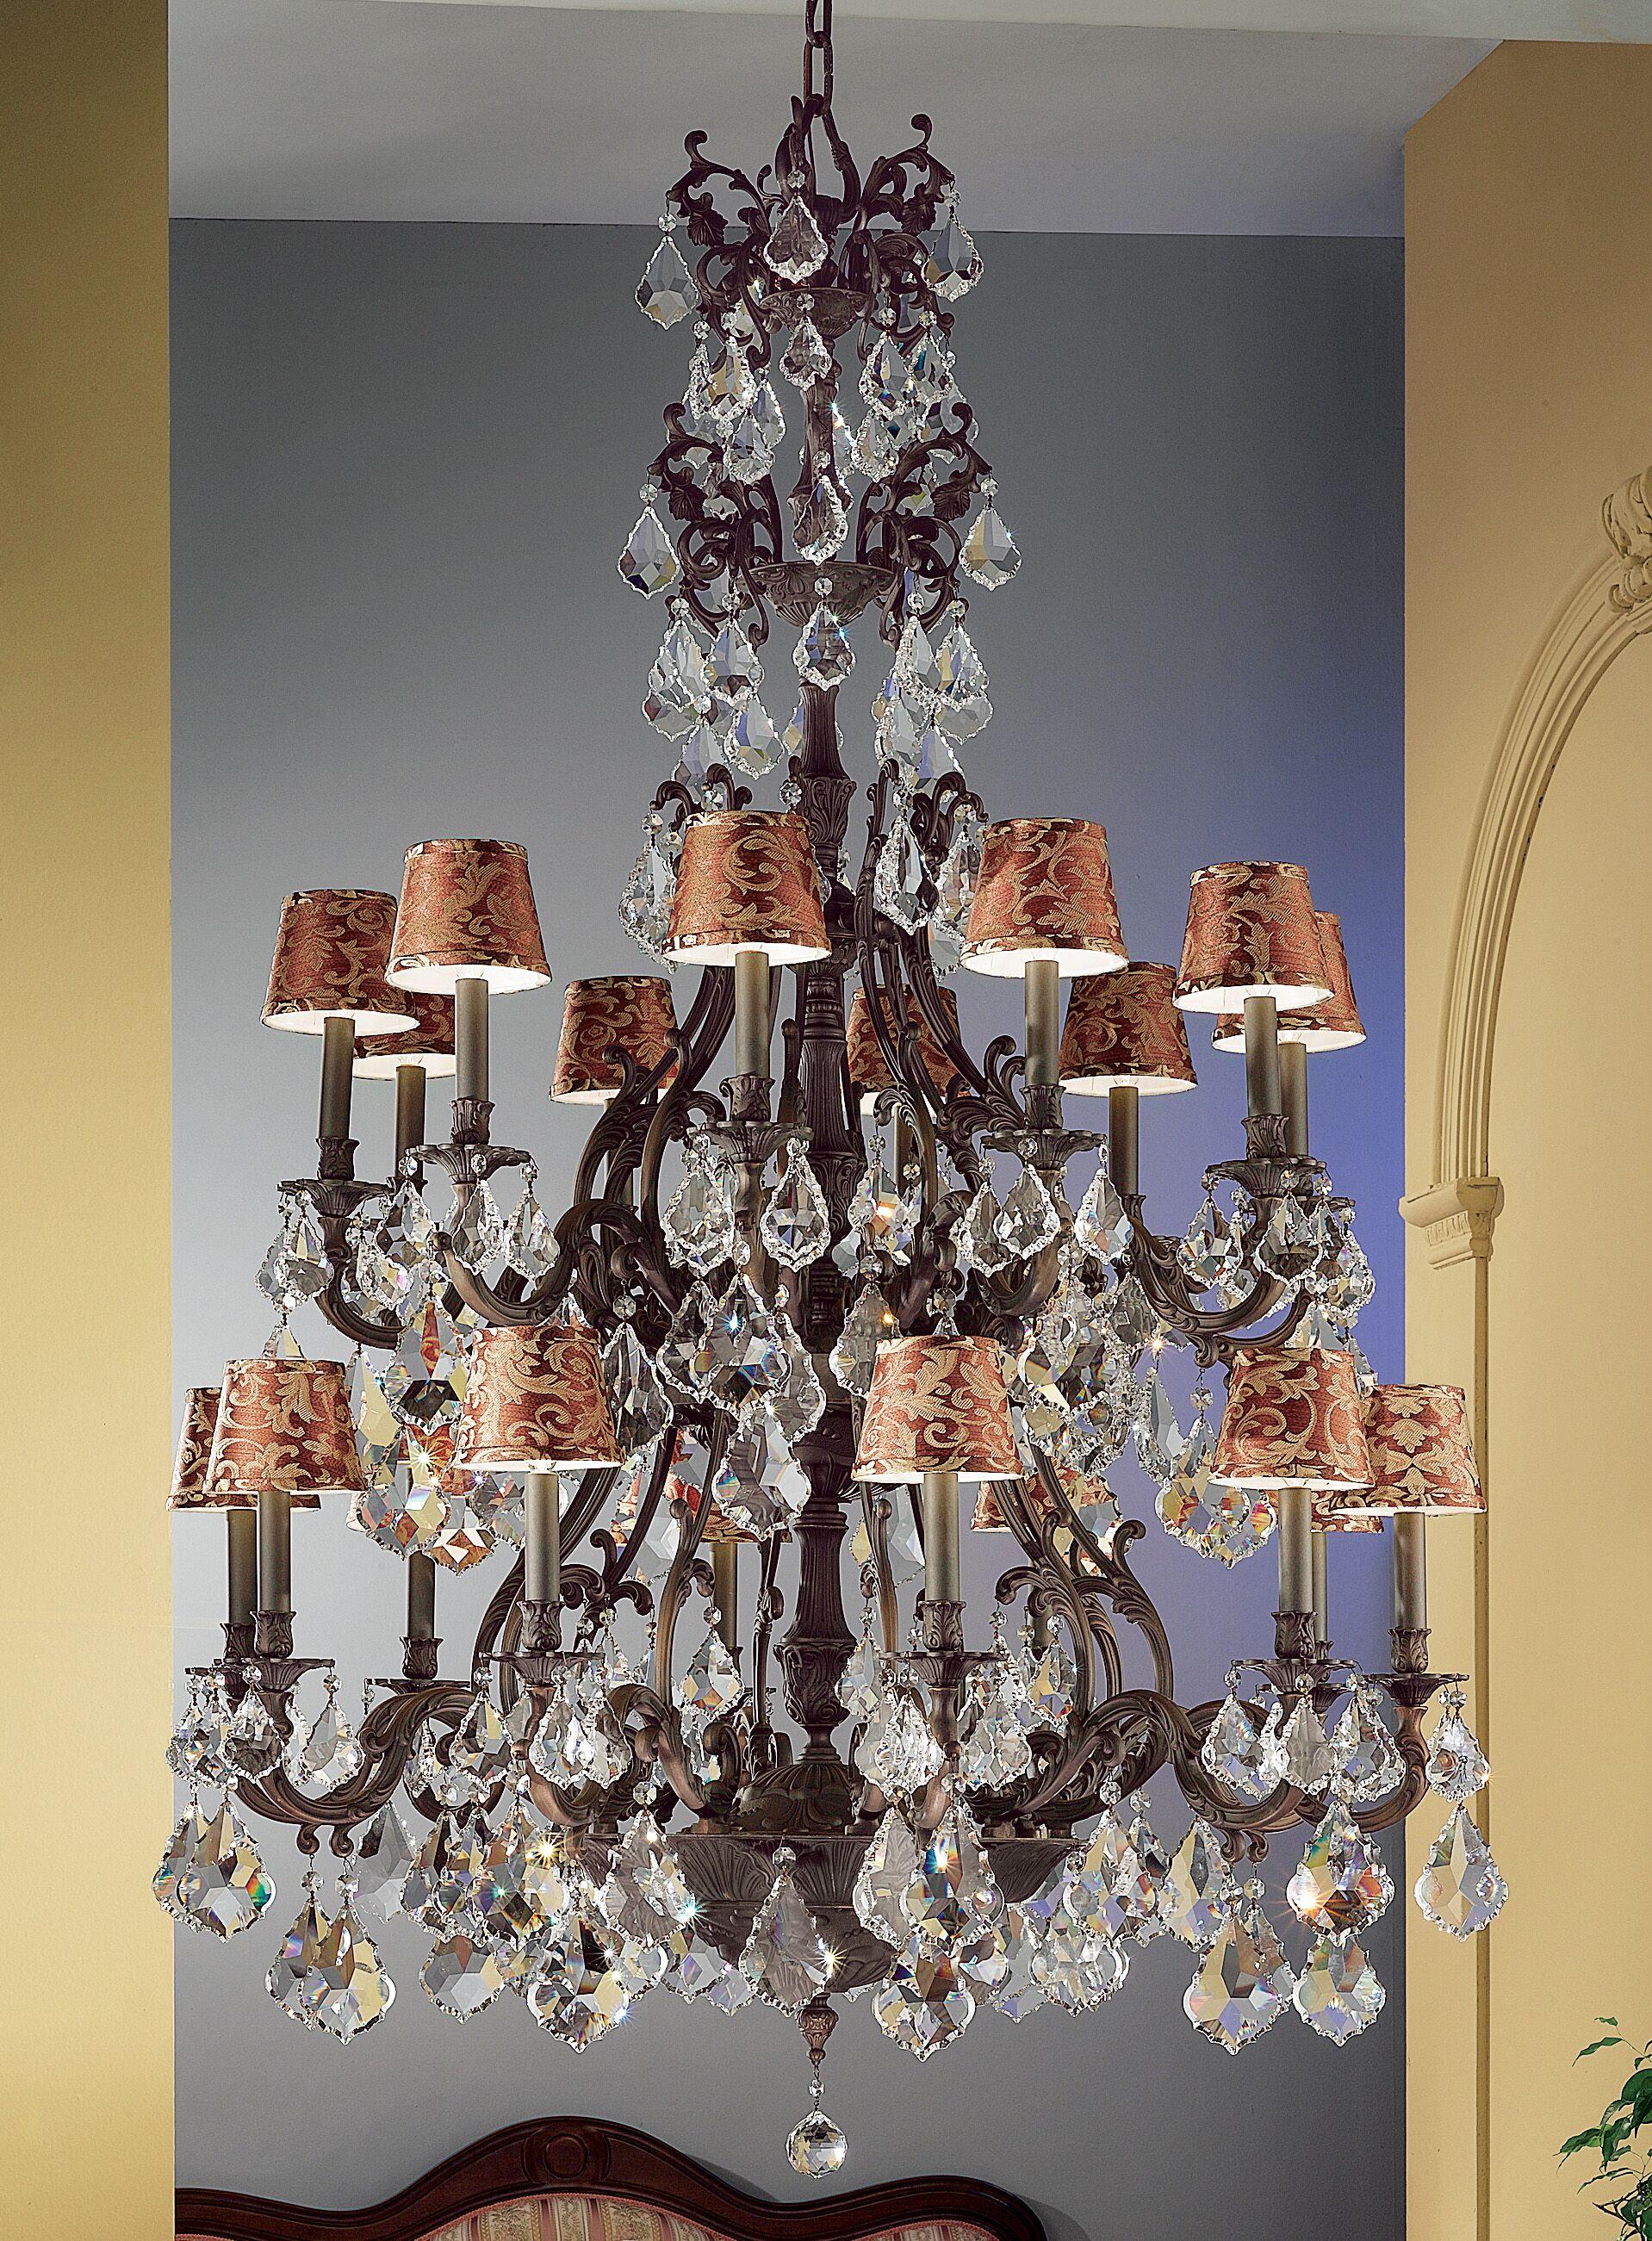 Majestic 20-Light Shaded Chandelier Finish: Aged Bronze, Crystal Type: Swarovski Elements